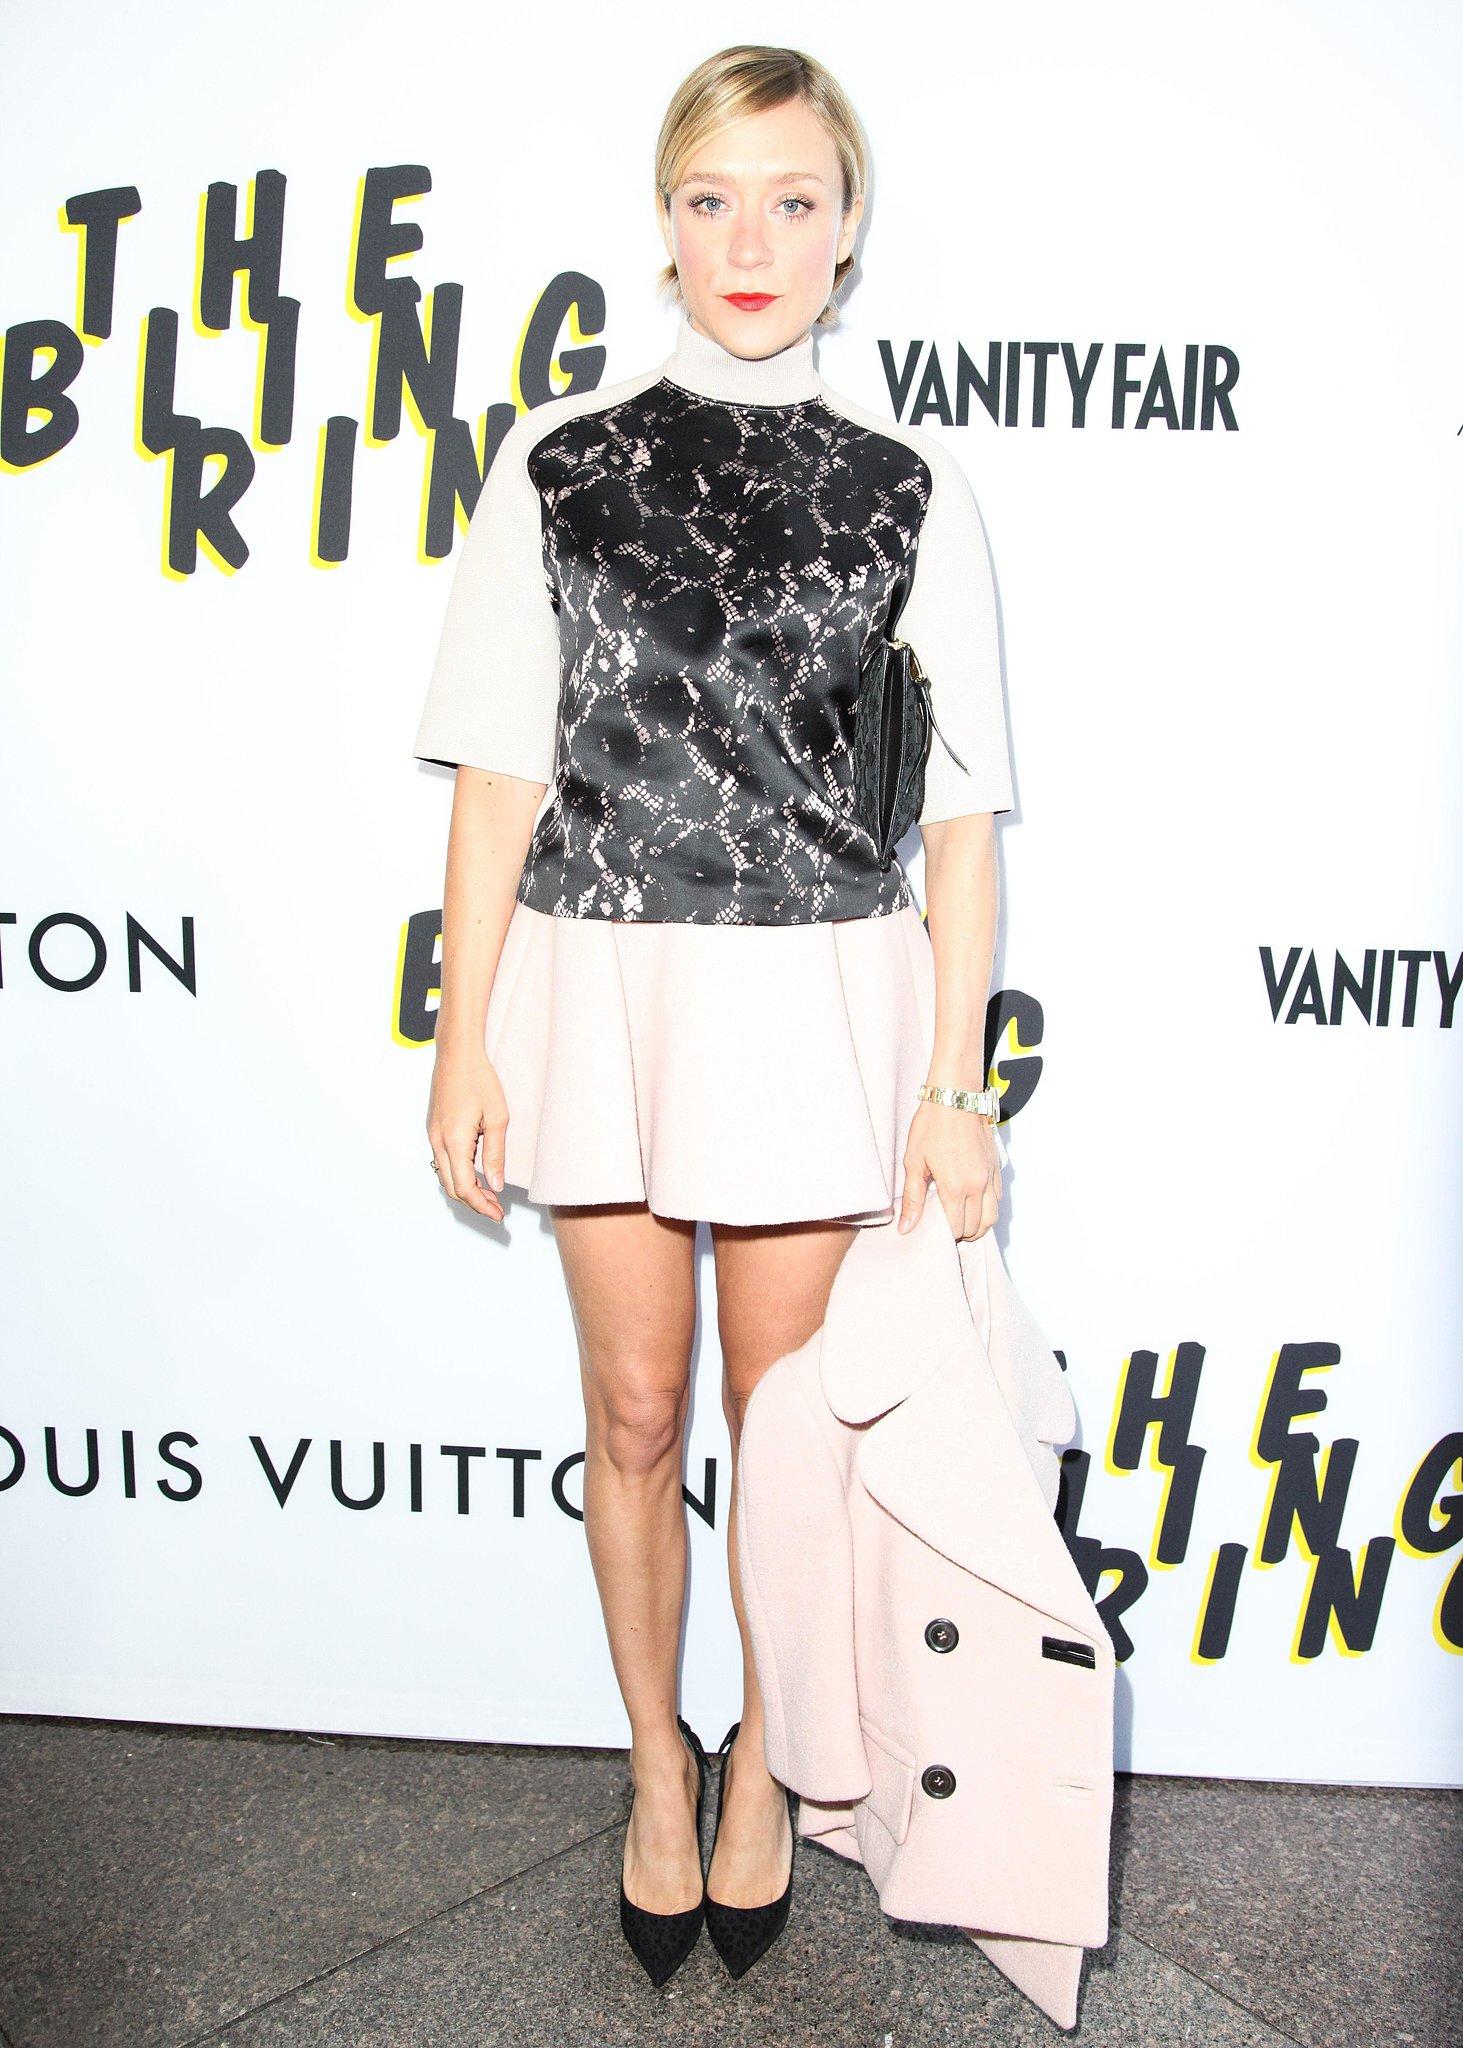 Chloë Sevigny at the Los Angeles premiere of The Bling Ring. Source: Aleks Kocev/BFAnyc.com